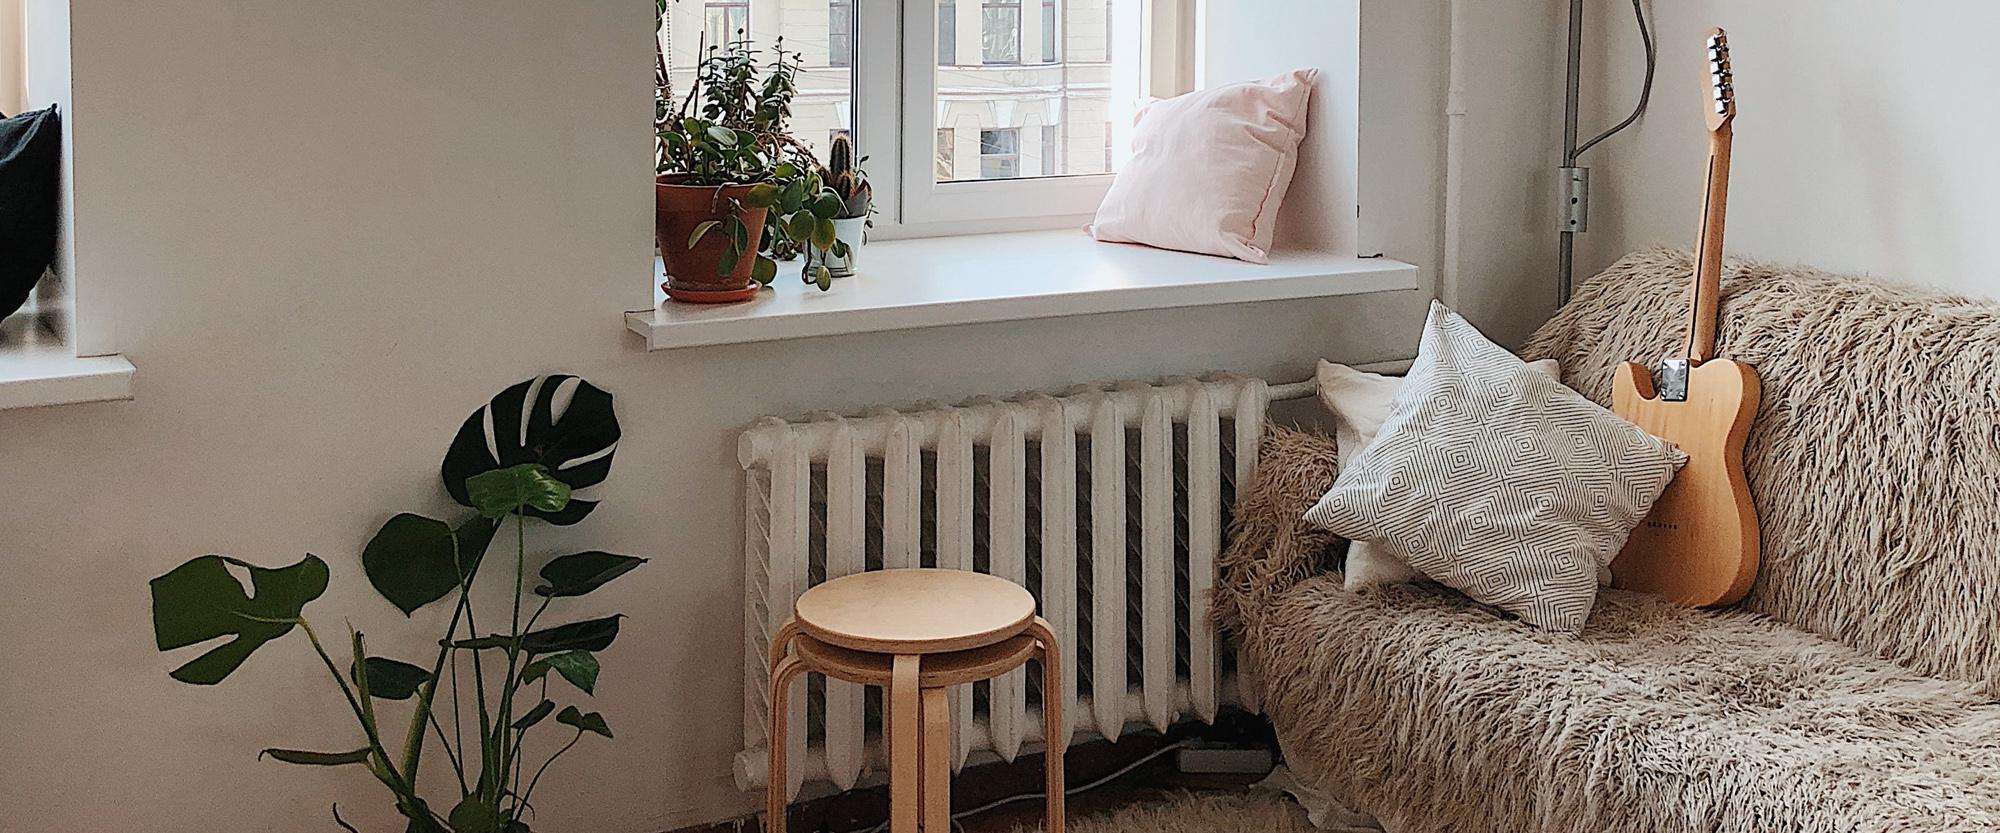 Je woonkamer duurzaam verbouwen